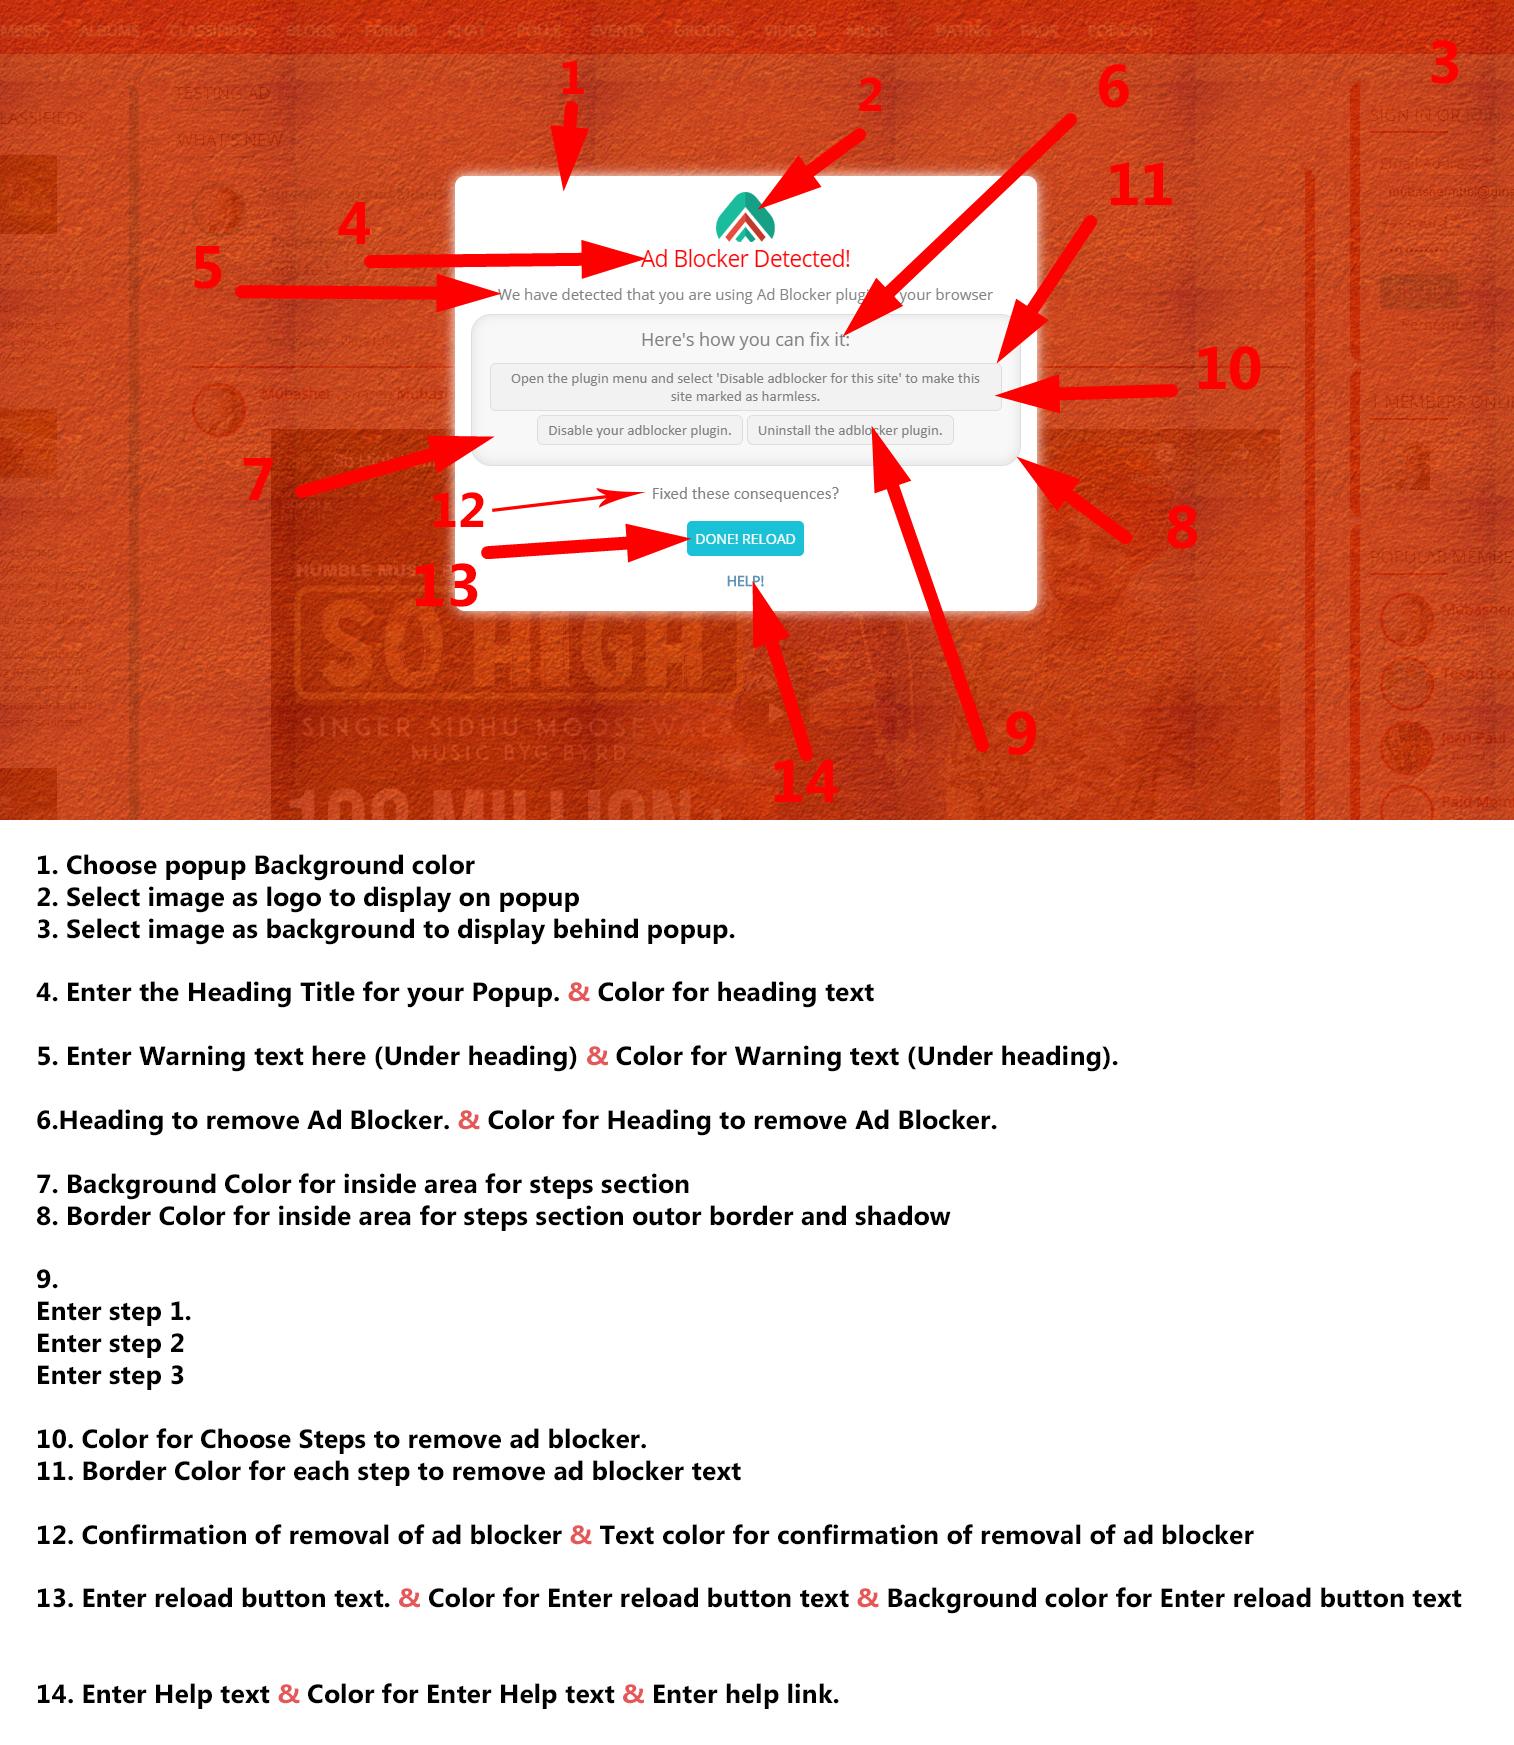 adblocker-preview-details.jpg